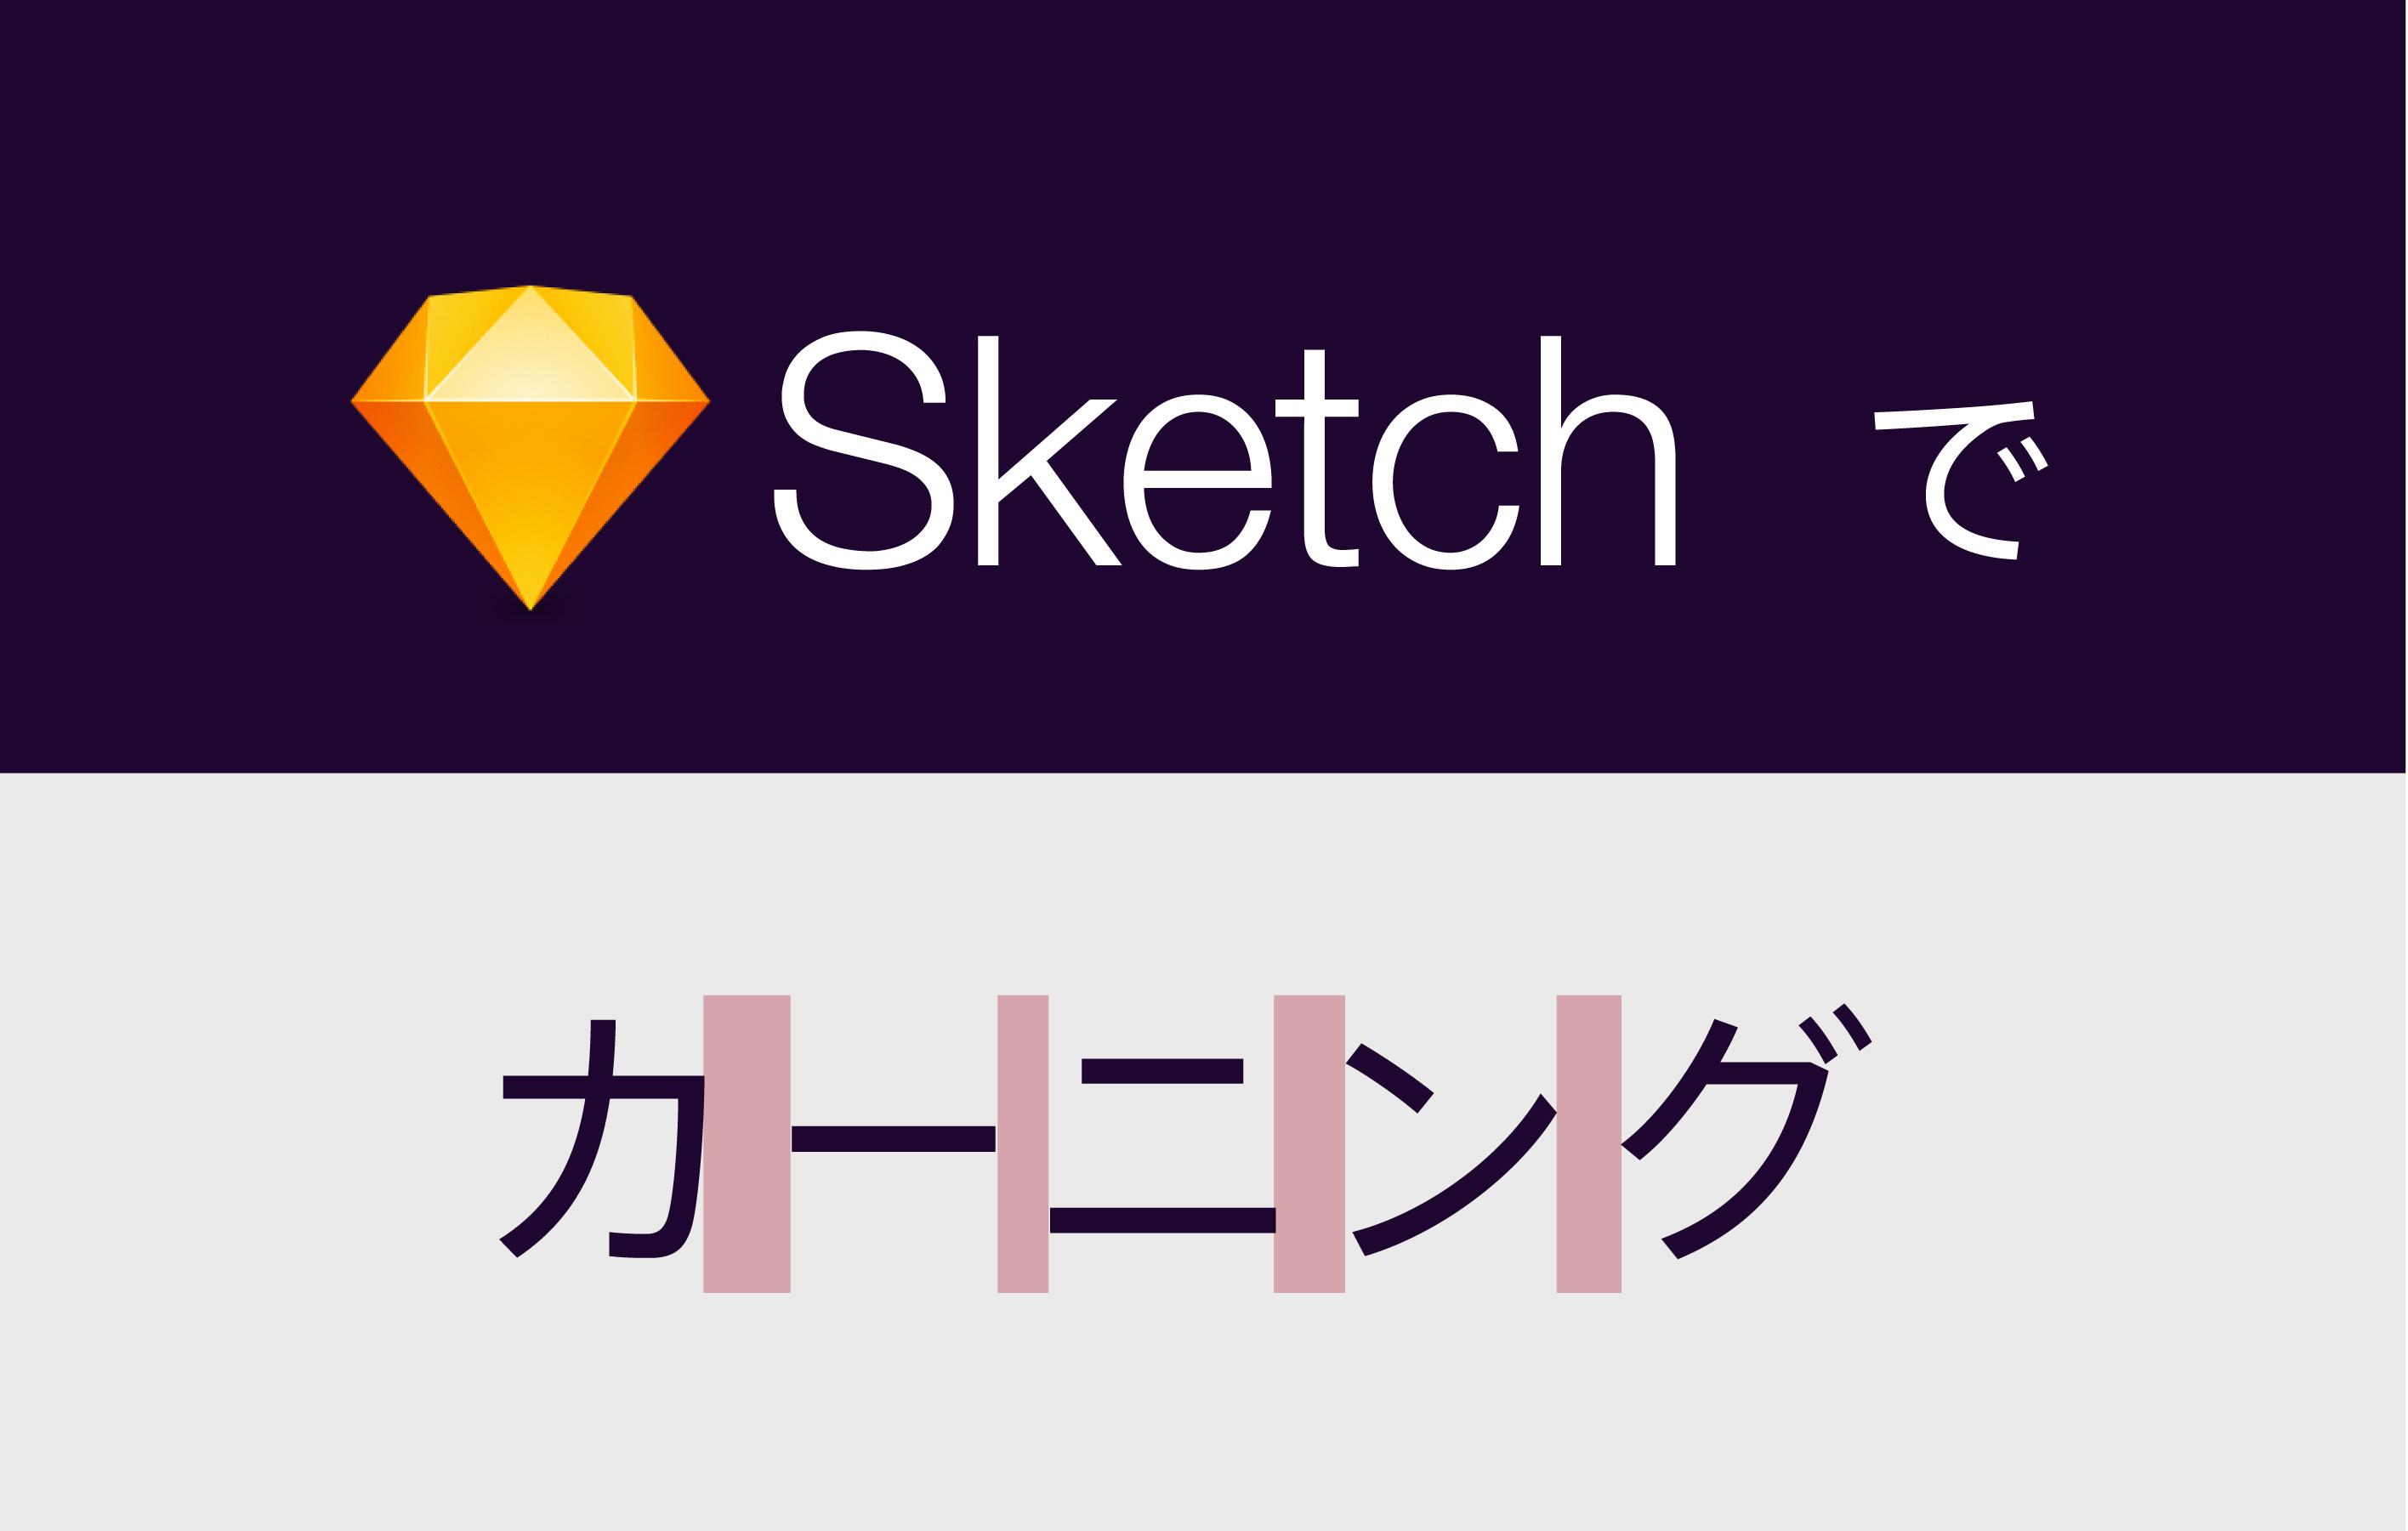 sketchkerning_sketchkerning.jpg